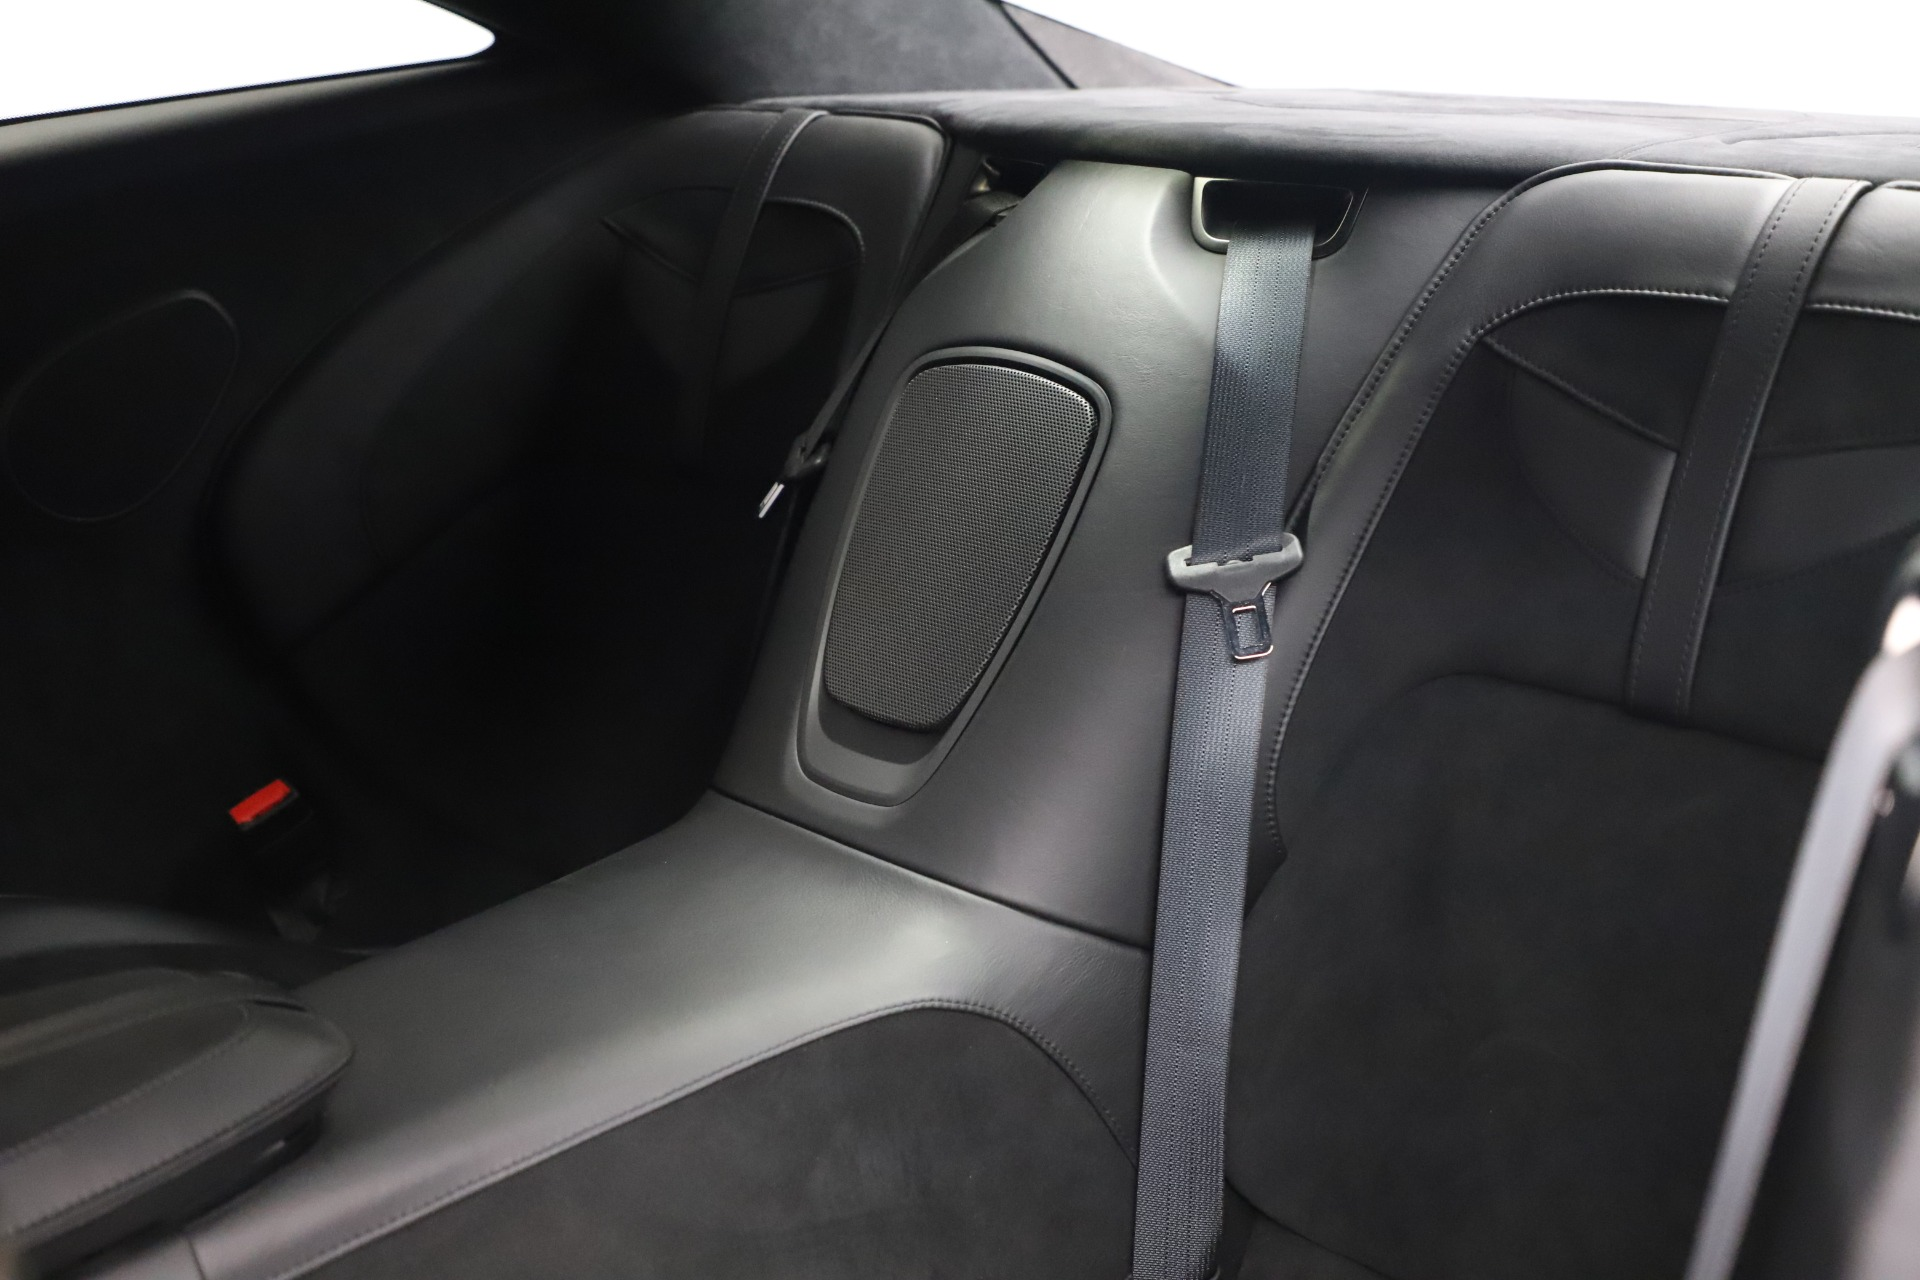 Used 2019 Aston Martin DBS Superleggera Coupe For Sale In Greenwich, CT. Alfa Romeo of Greenwich, A1438B 3570_p17